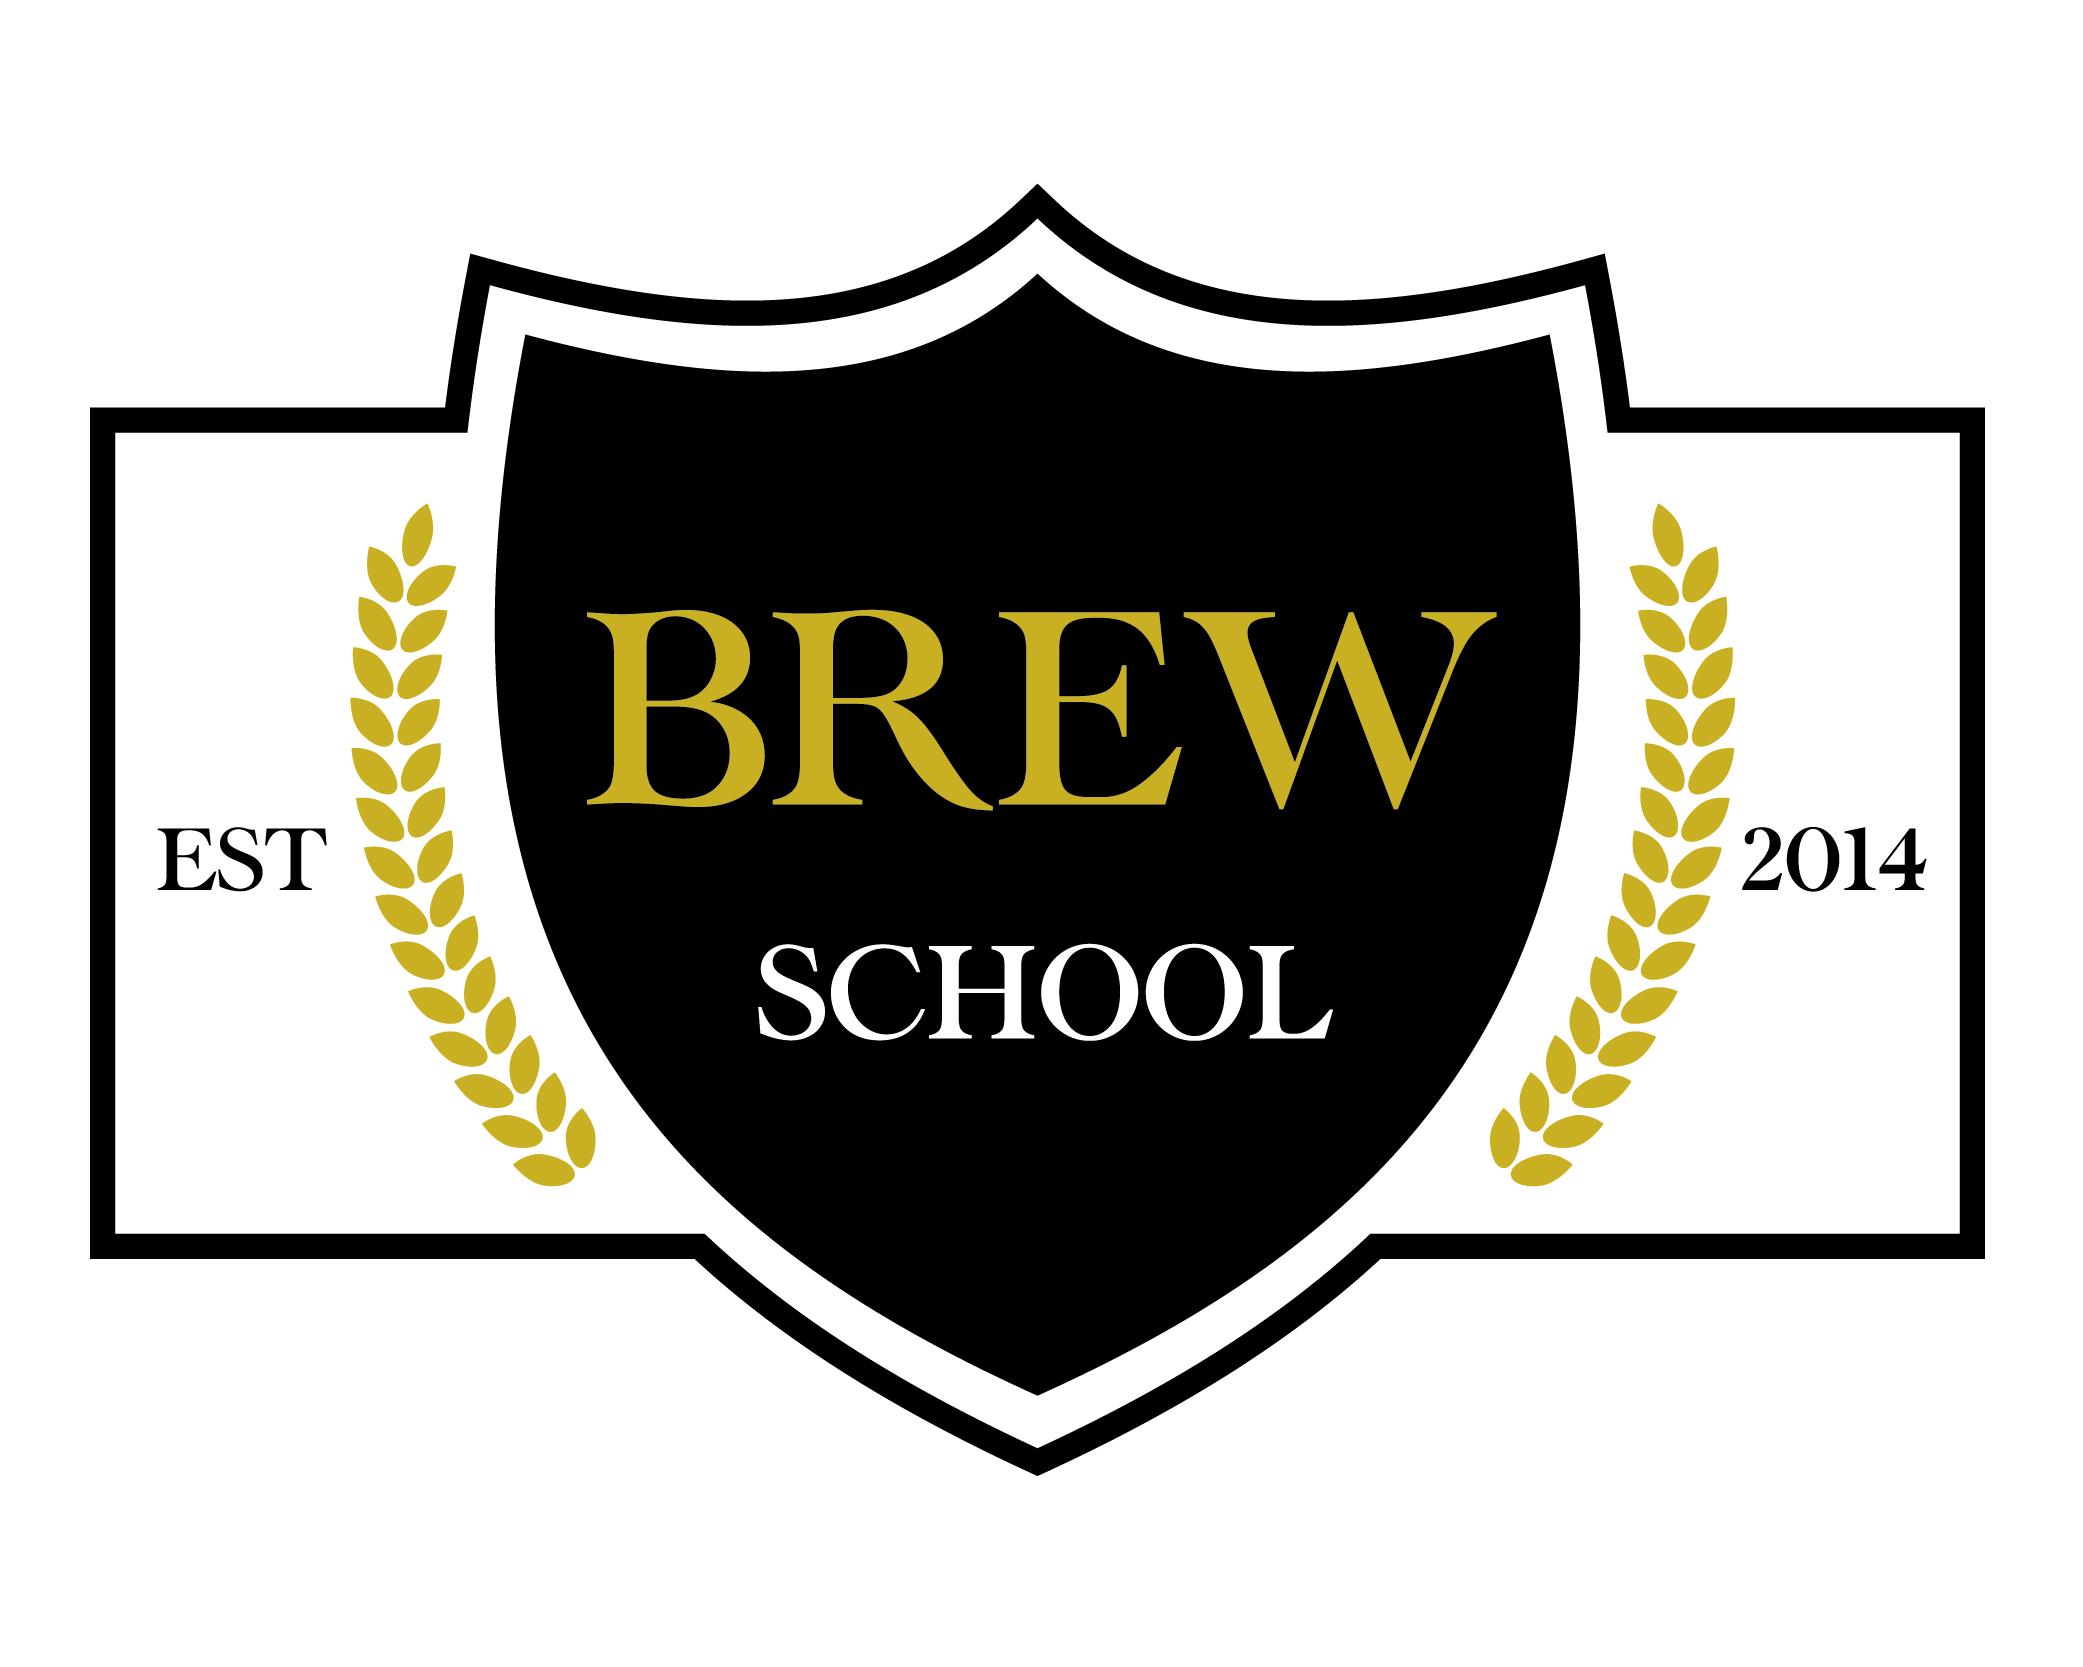 brew-shool-logo-gold-black